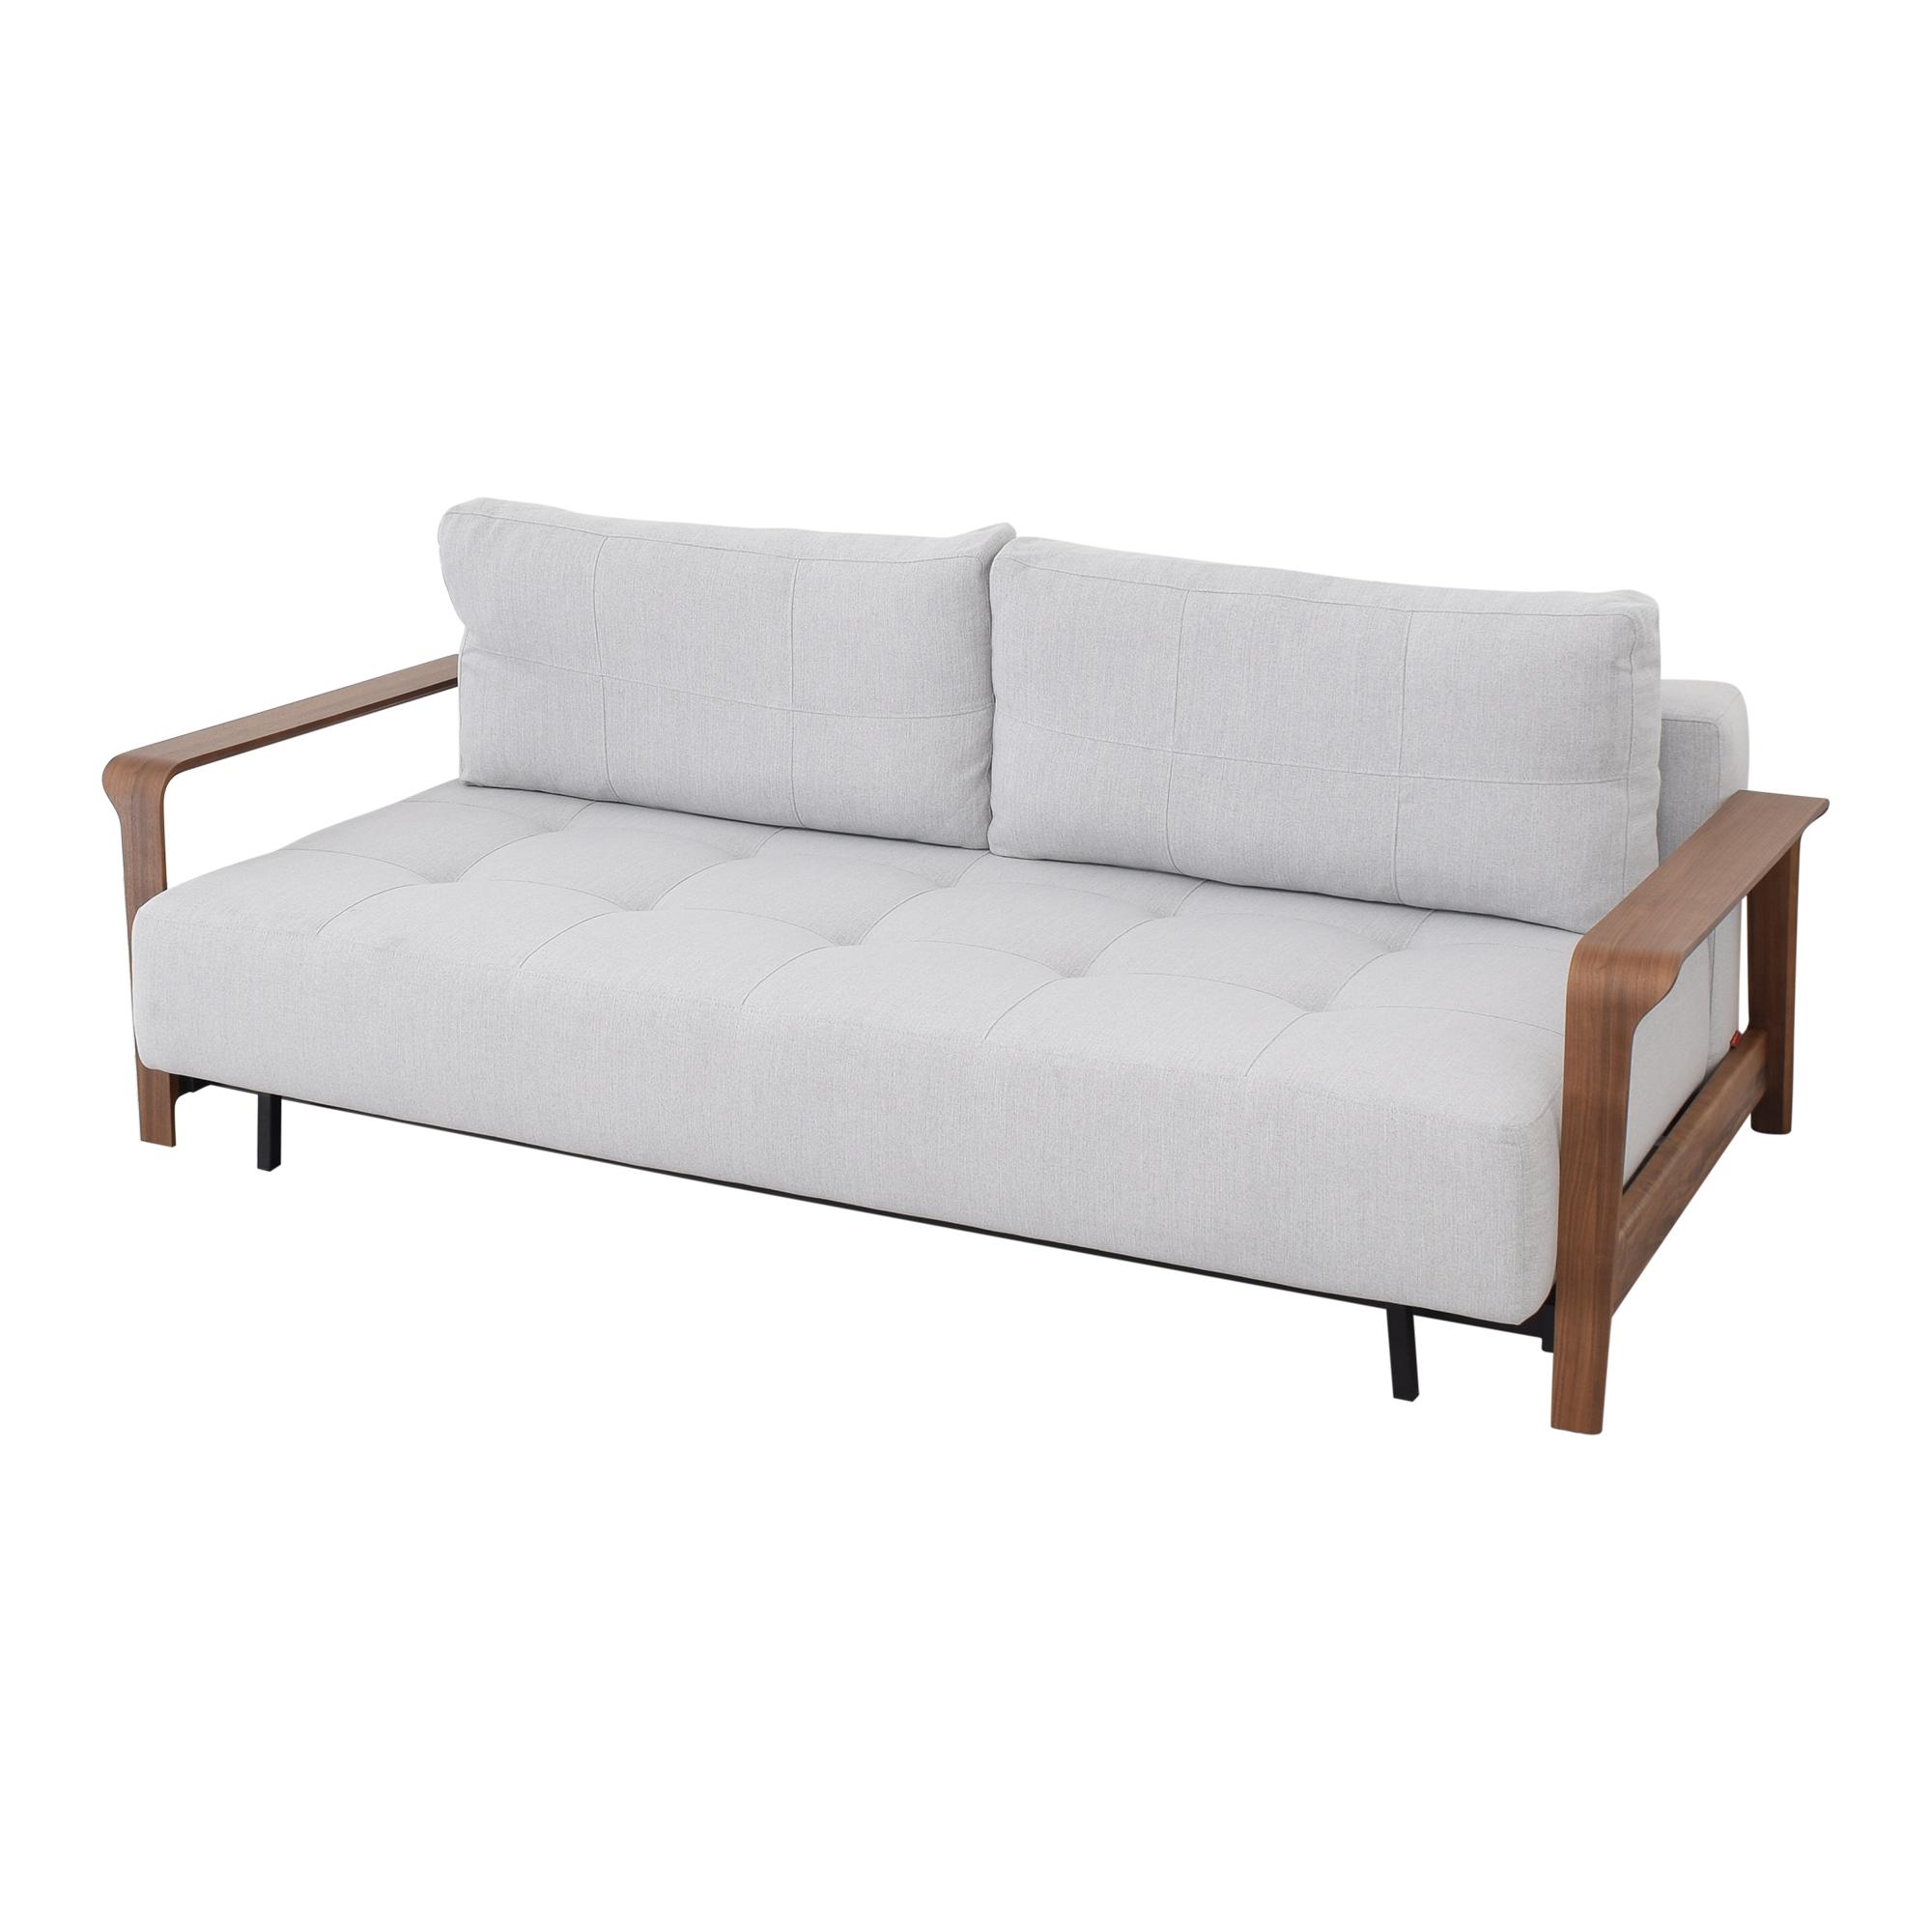 buy Innovation Living Innovation Living Ran Deluxe Sofa online